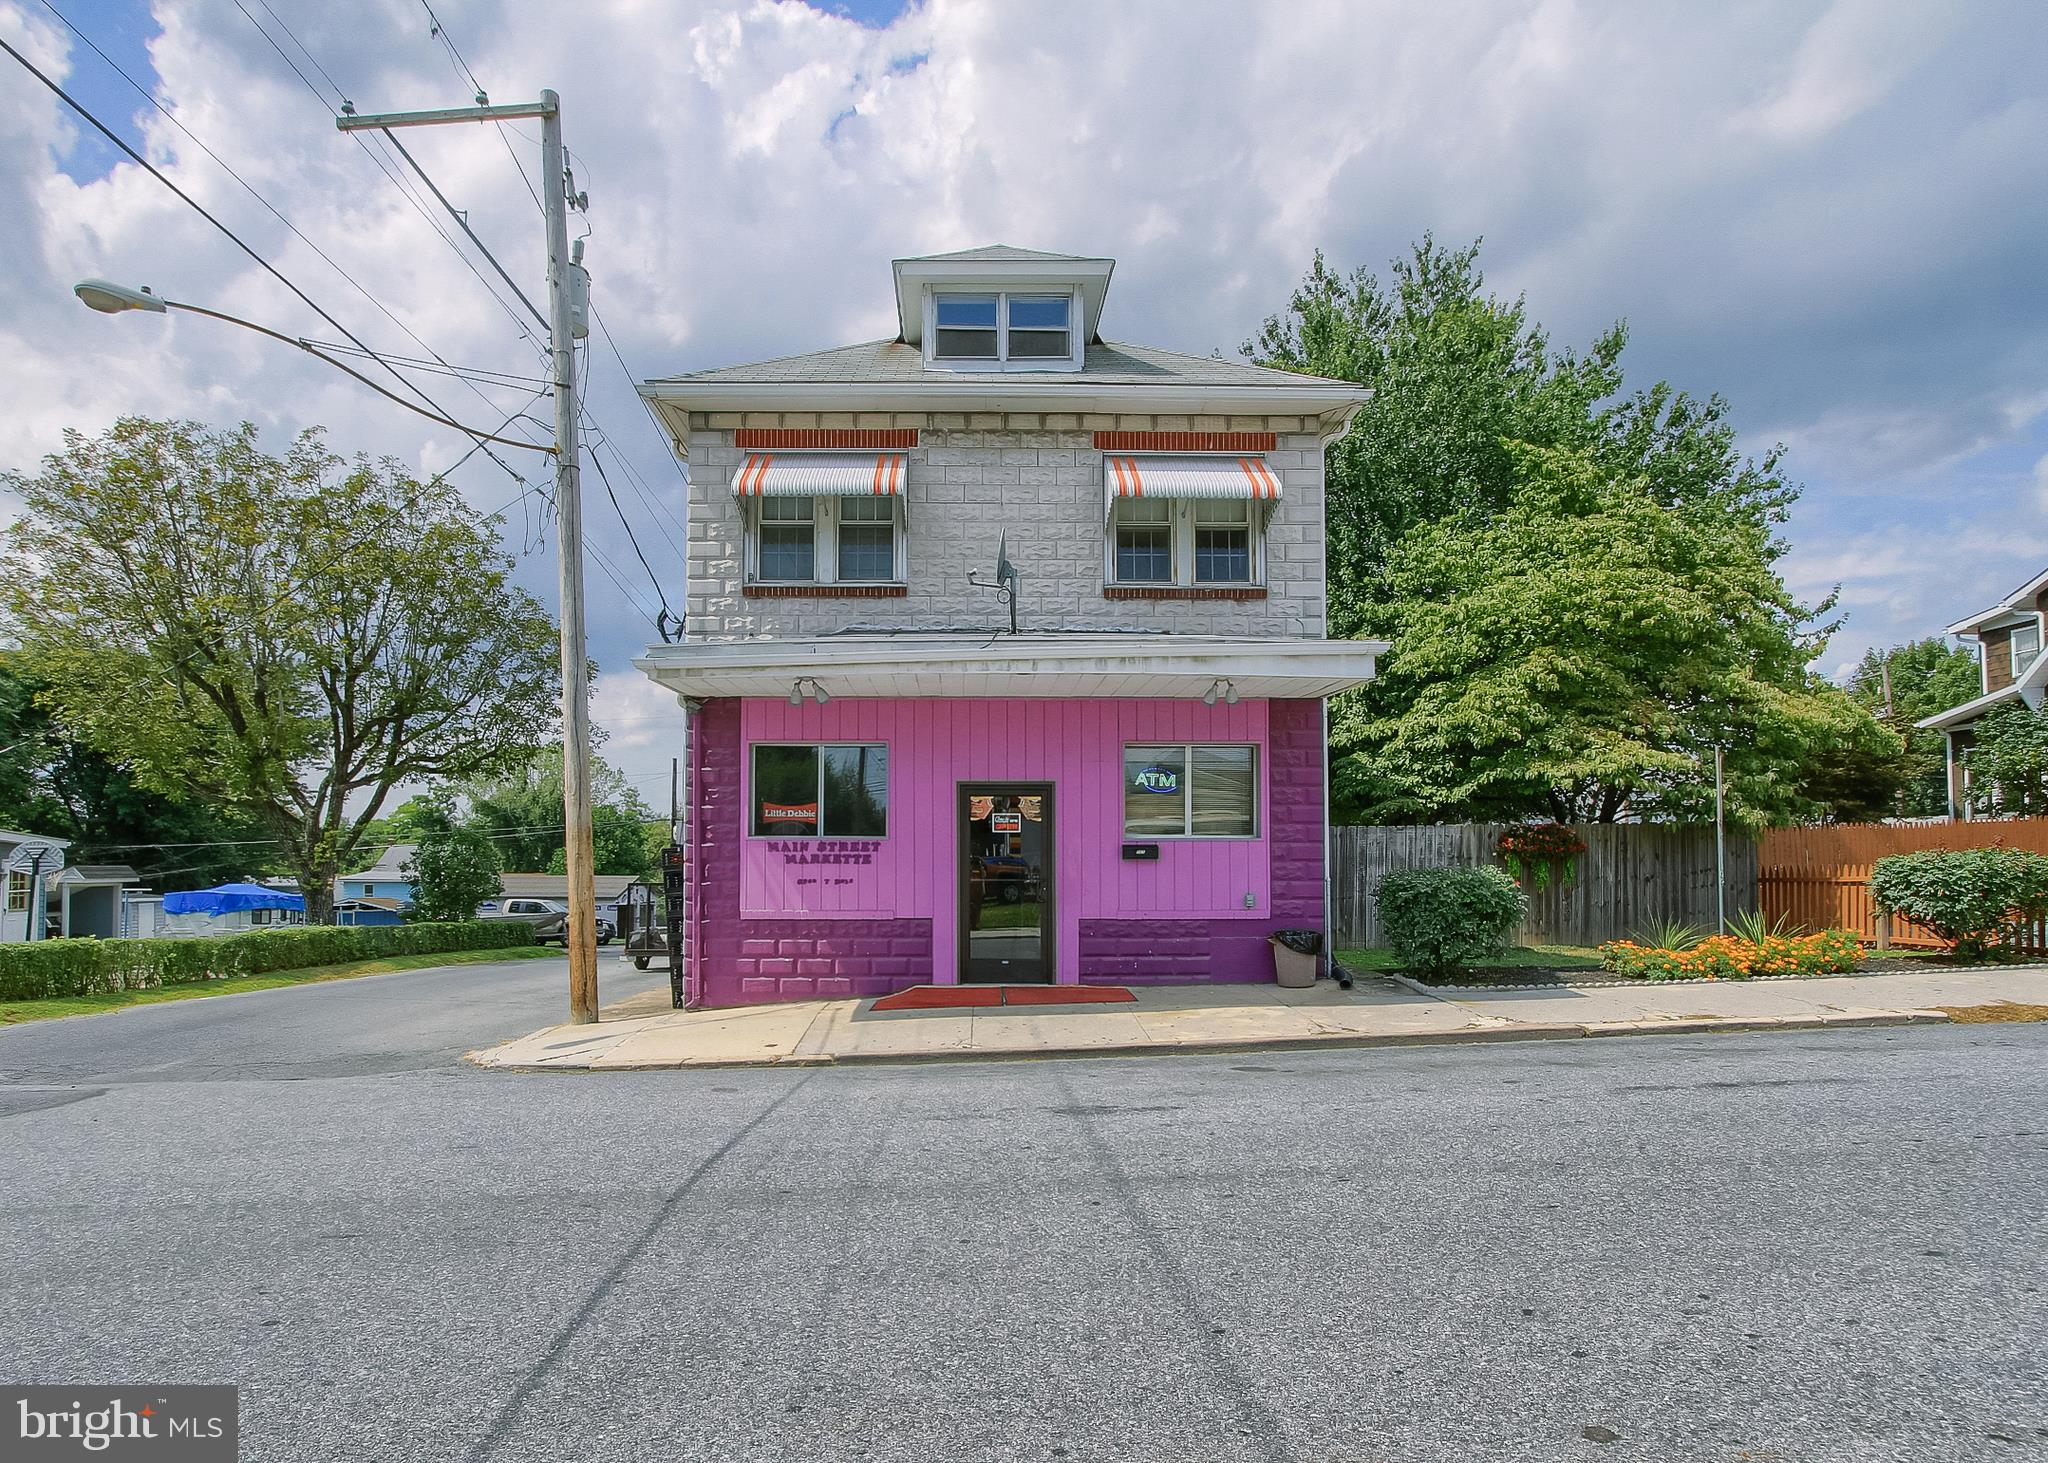 565 MAIN STREET, HARRISBURG, PA 17113